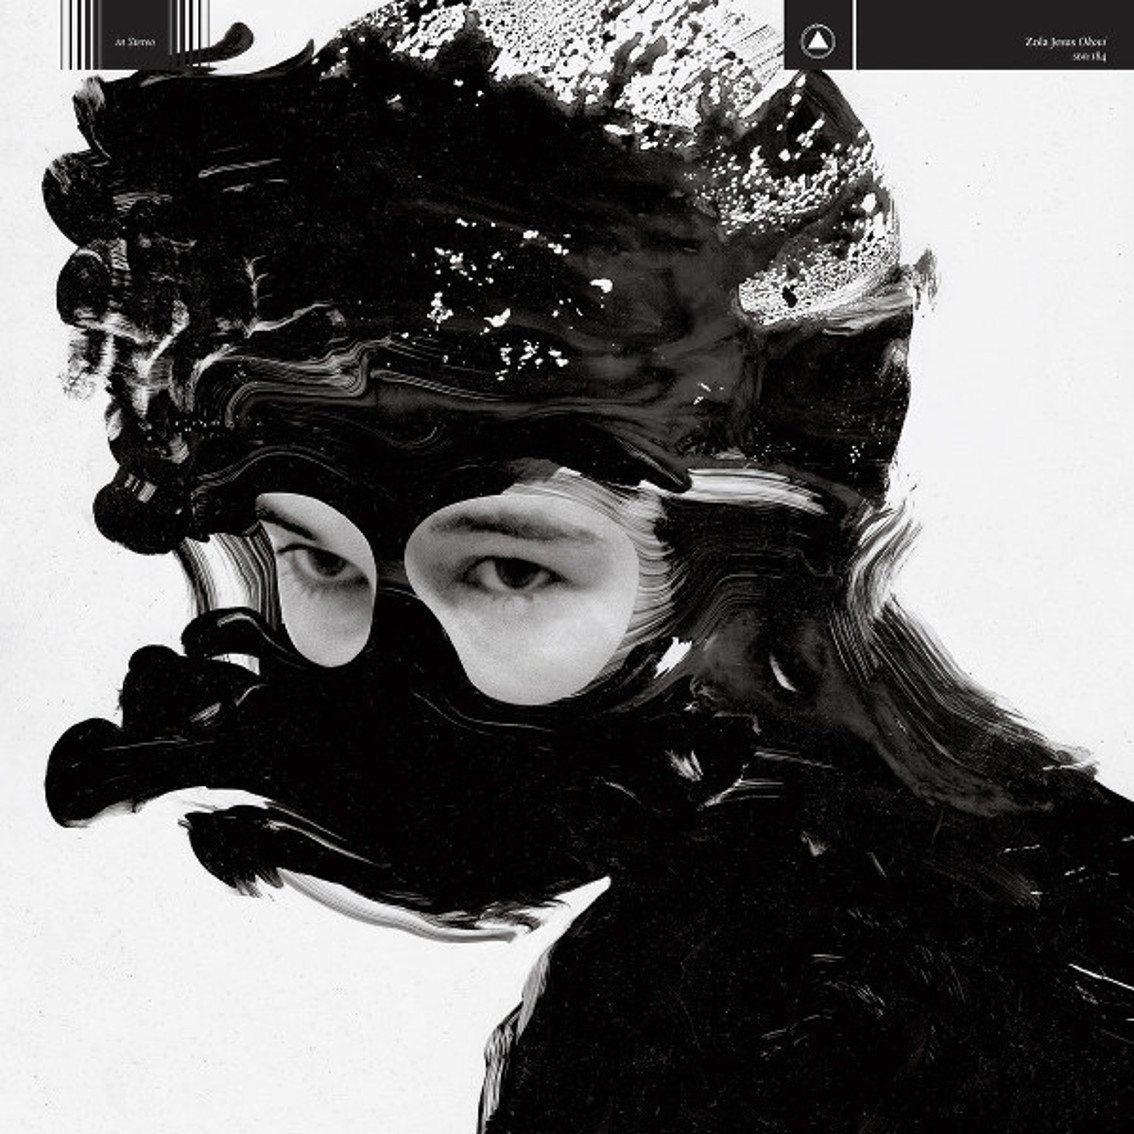 Synthpop artist Zola Jesus prepares for September release'Okovi' album - also available on vinyl